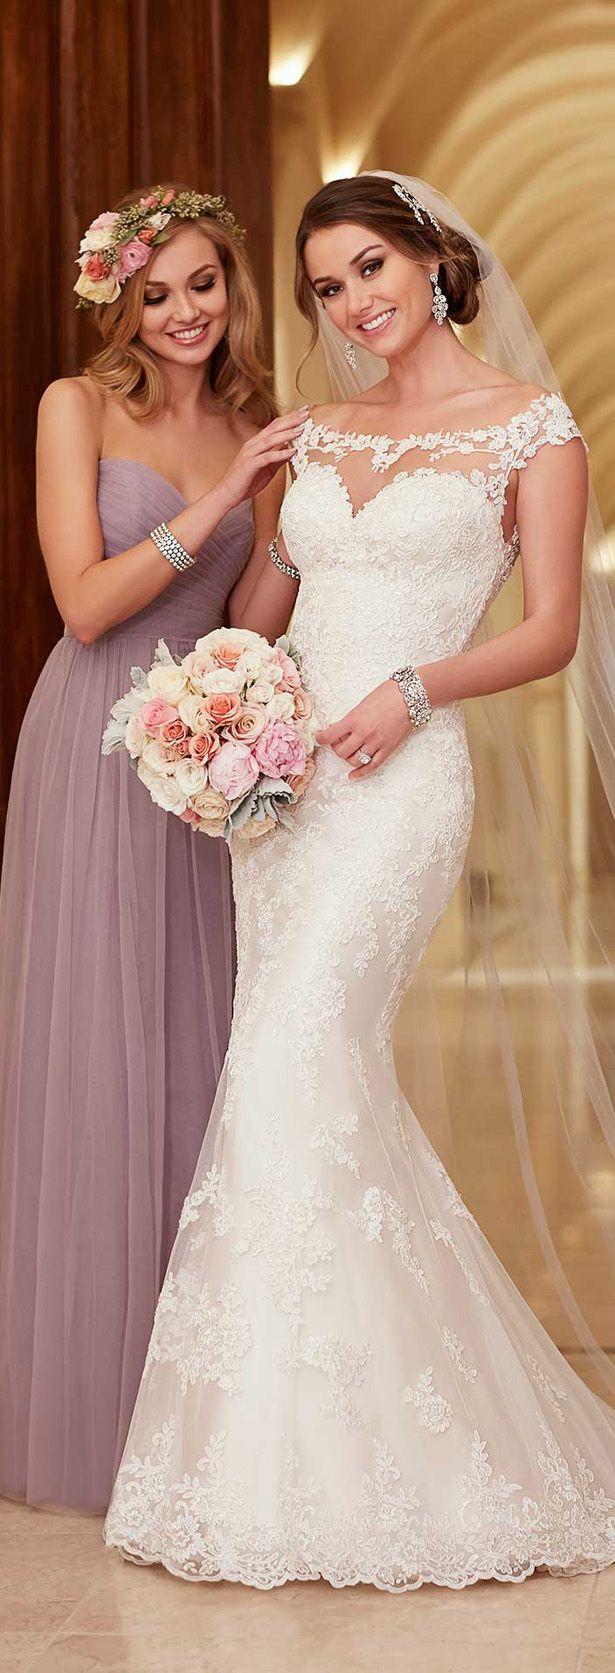 Wedding dress huntsville al  Alexis Flippen aaflip on Pinterest